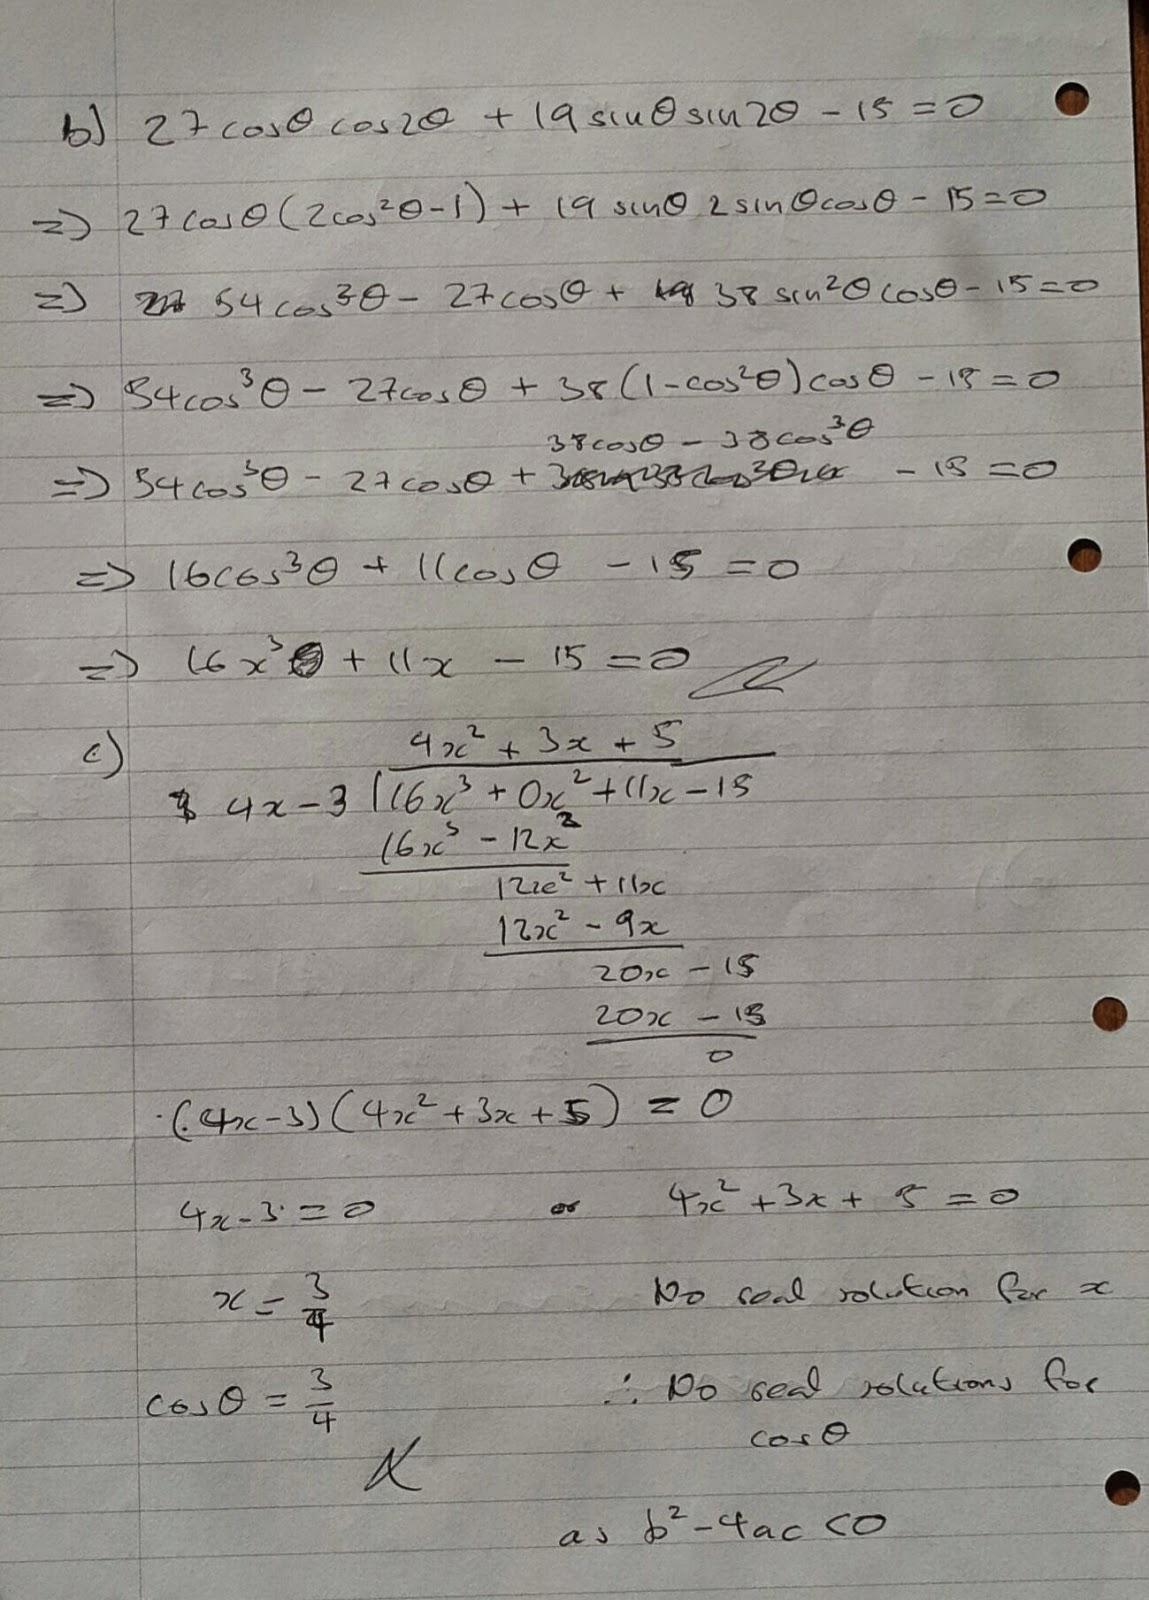 A Level Maths Notes: AQA Core 4 Winter 2012 Exam Paper